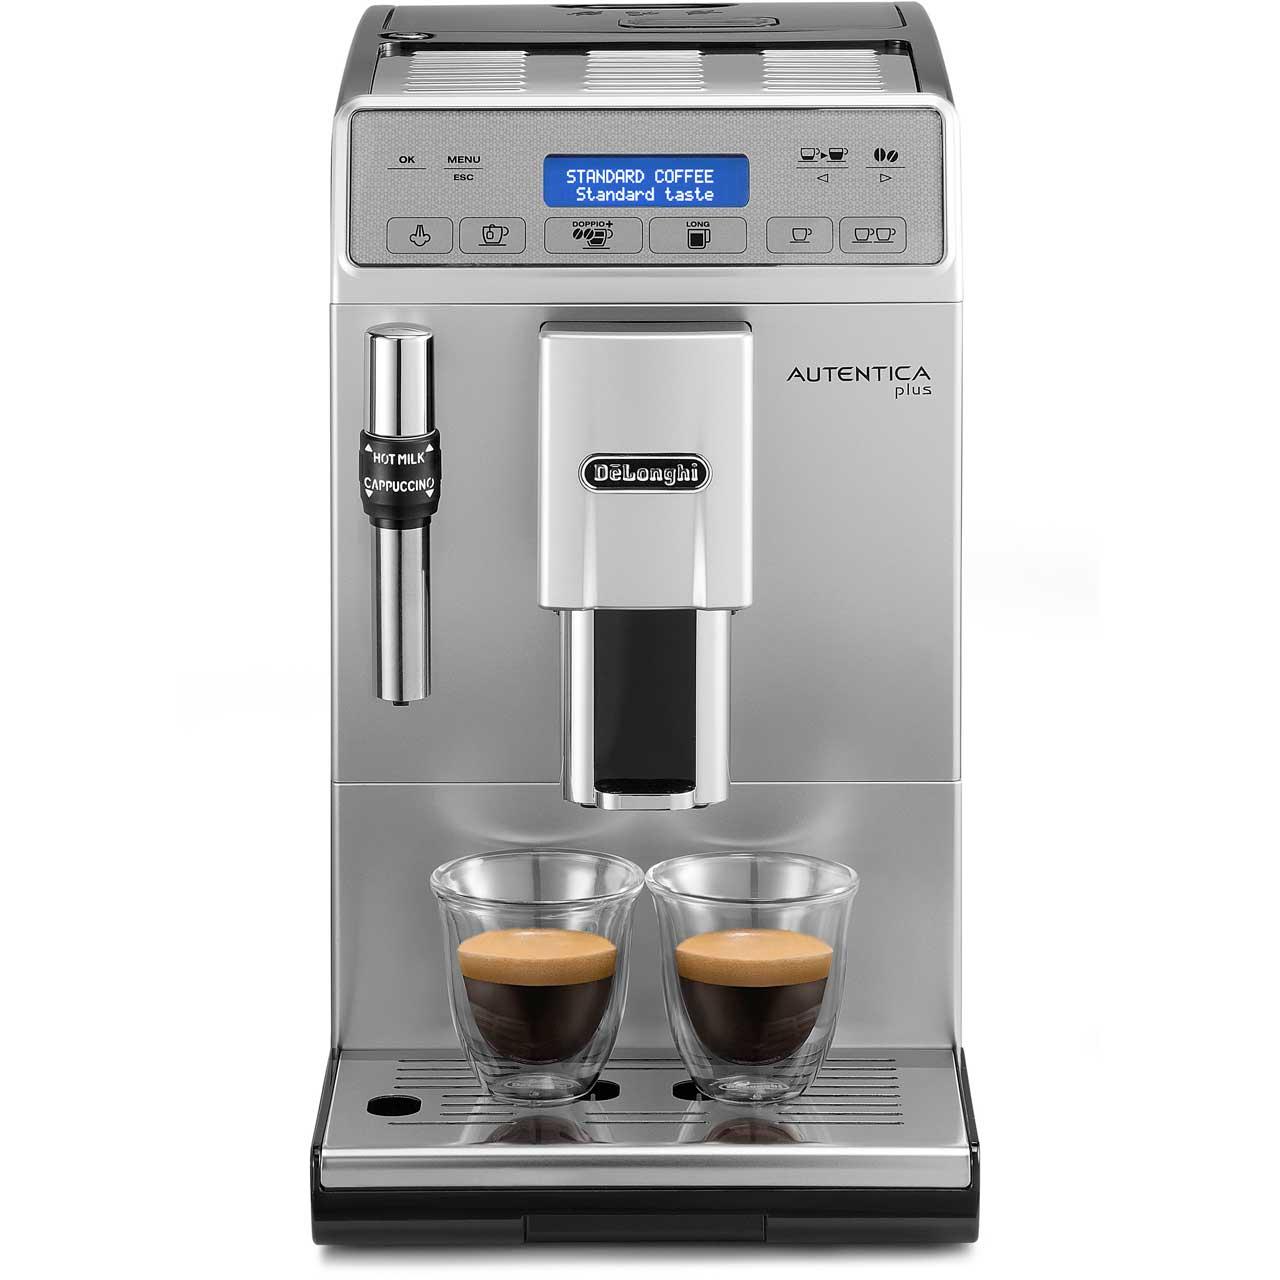 9a32caa8772 ... De'Longhi Autentica ETAM29.620.SB Bean to Cup Coffee Machine - Silver  ...